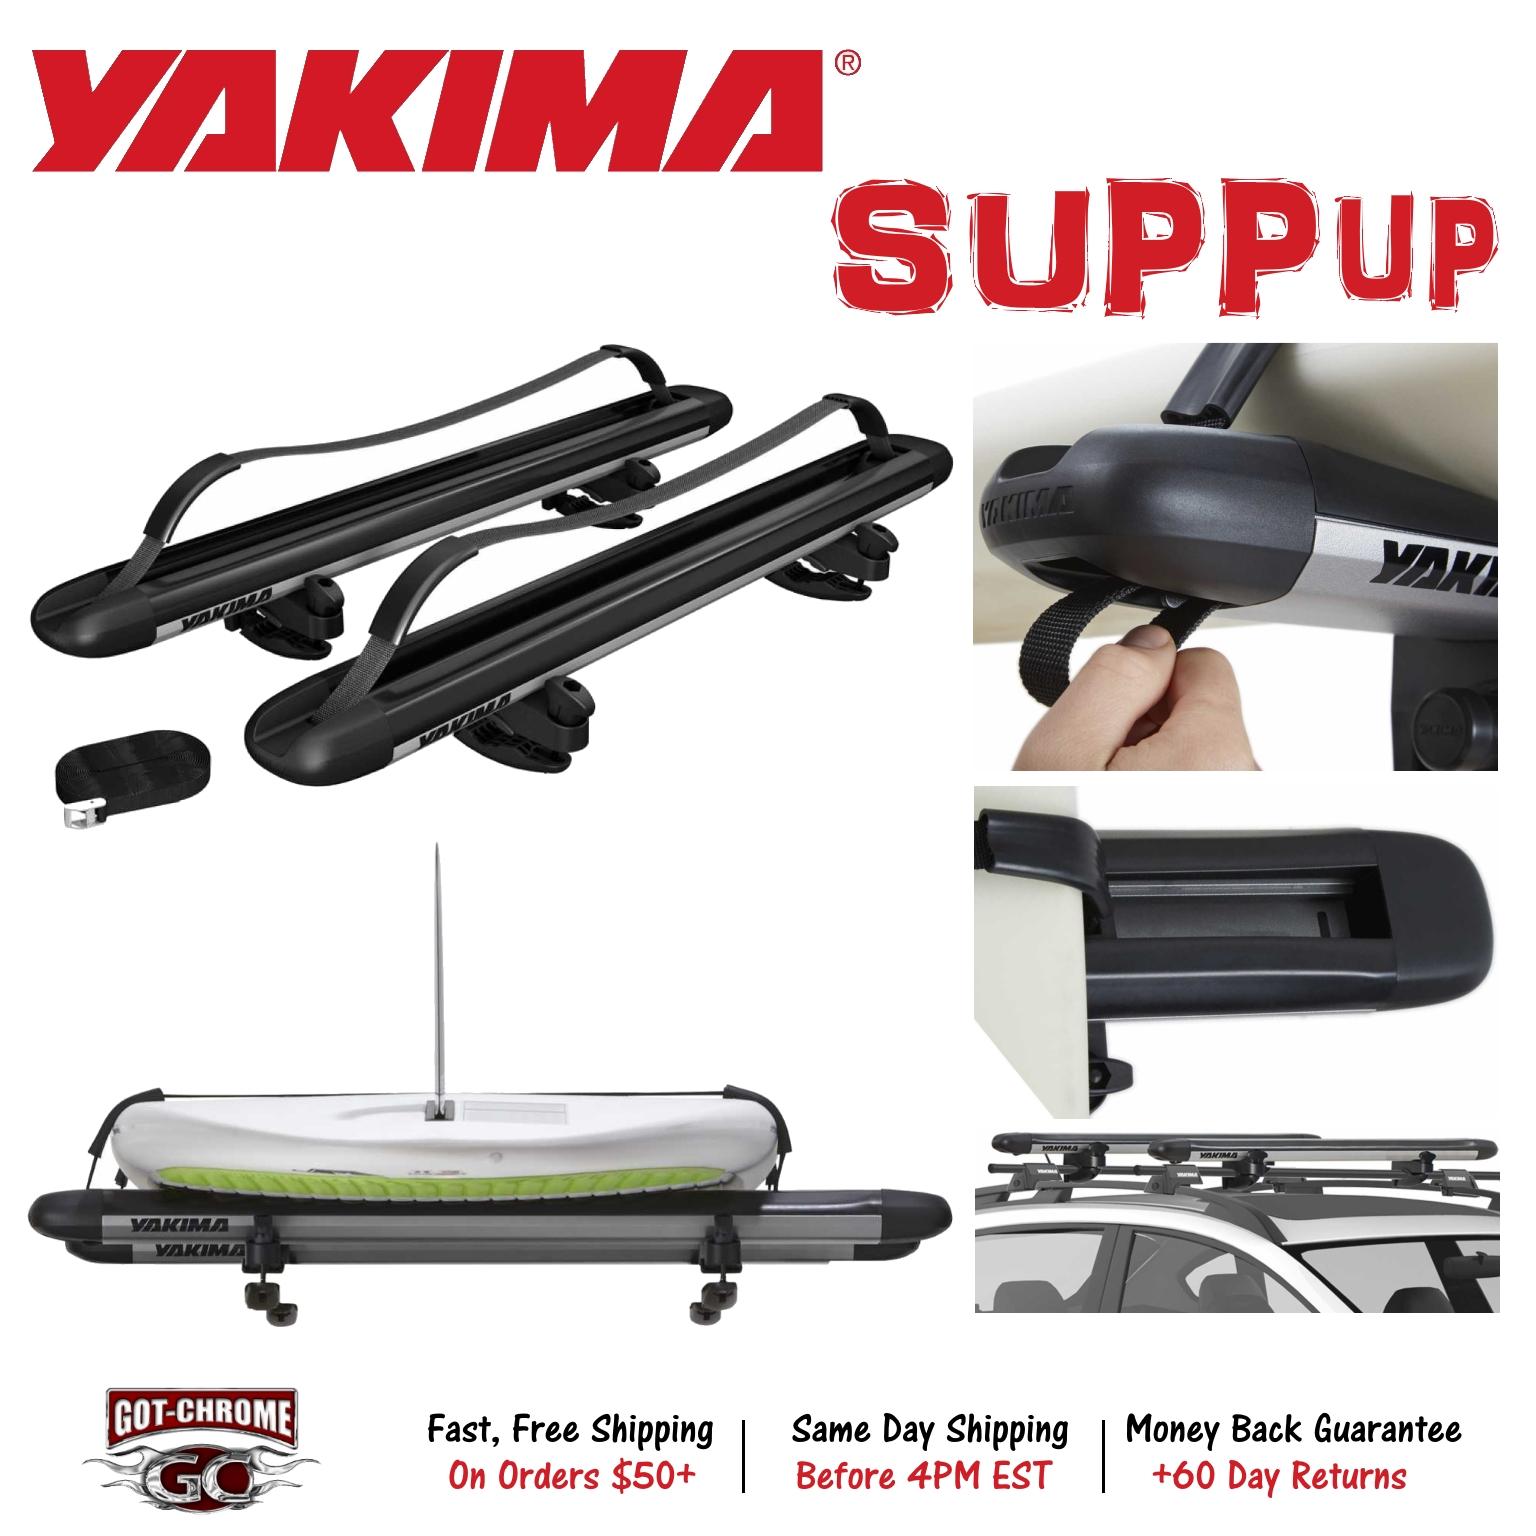 8004078 Yakima SUPPup SUP Stand Up Paddle Board